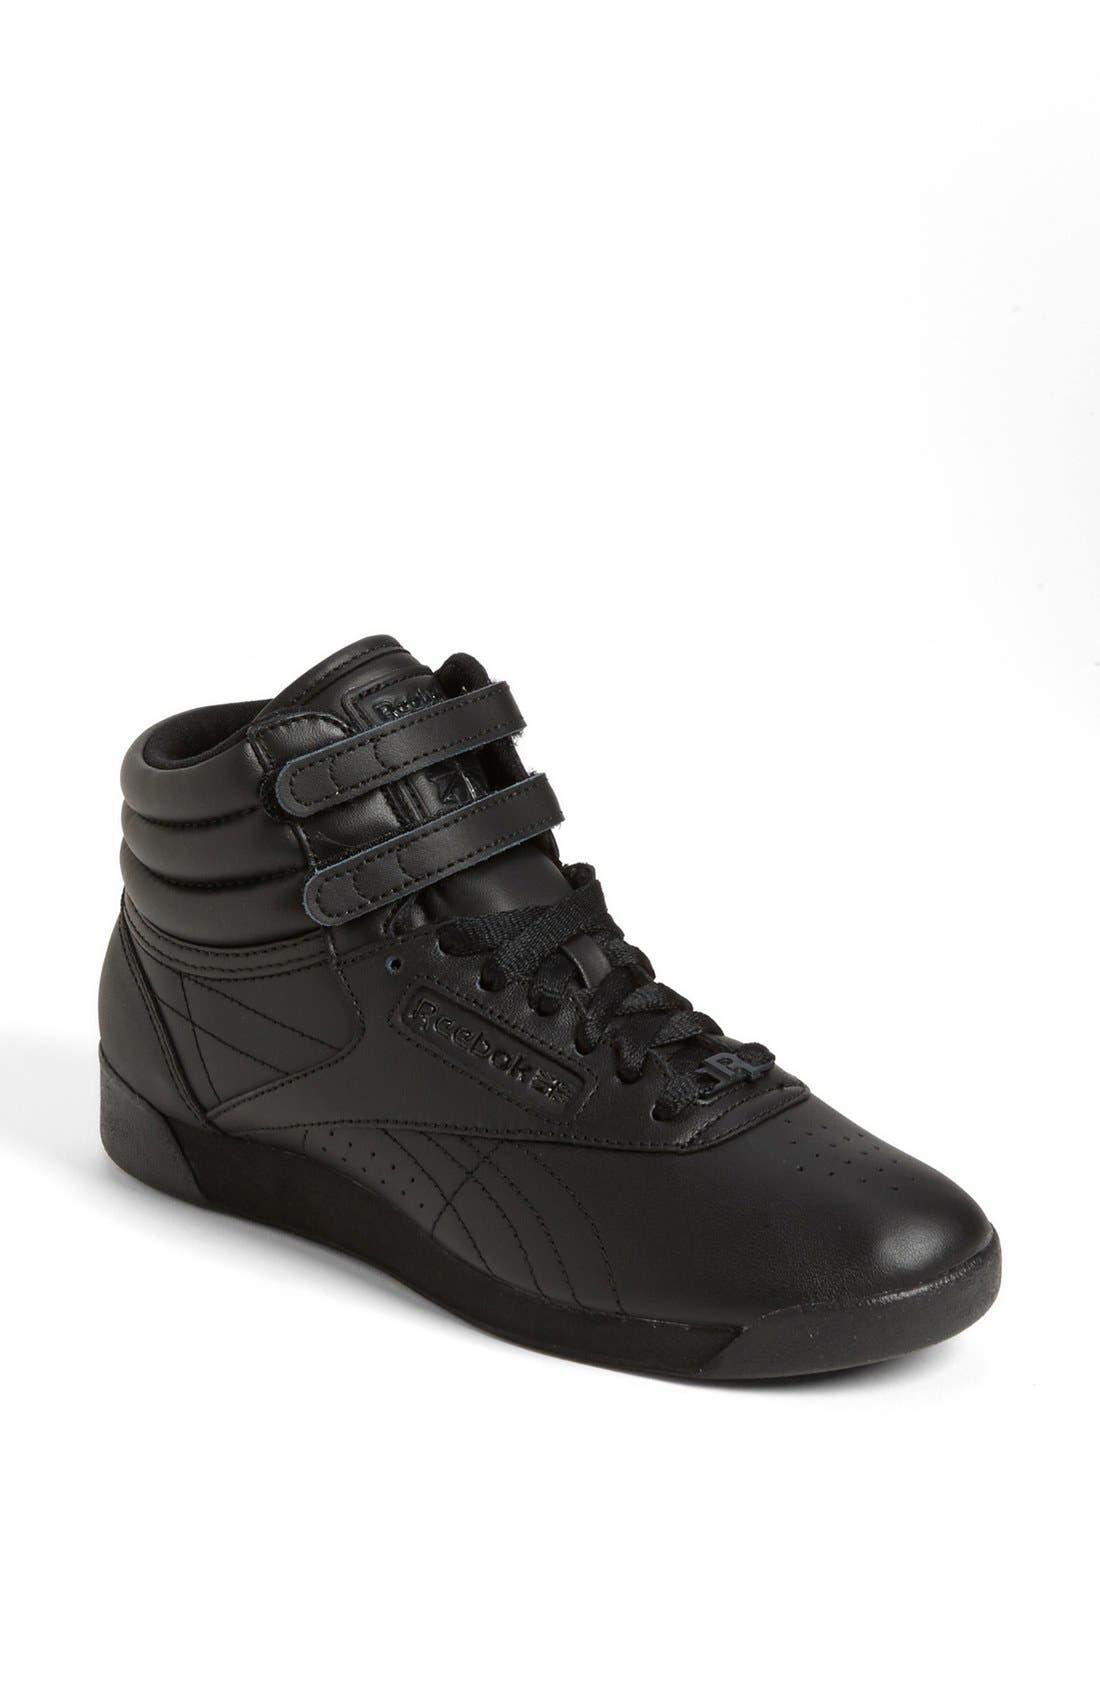 Alternate Image 1 Selected - Reebok 'Freestyle Hi' Sneaker (Women)